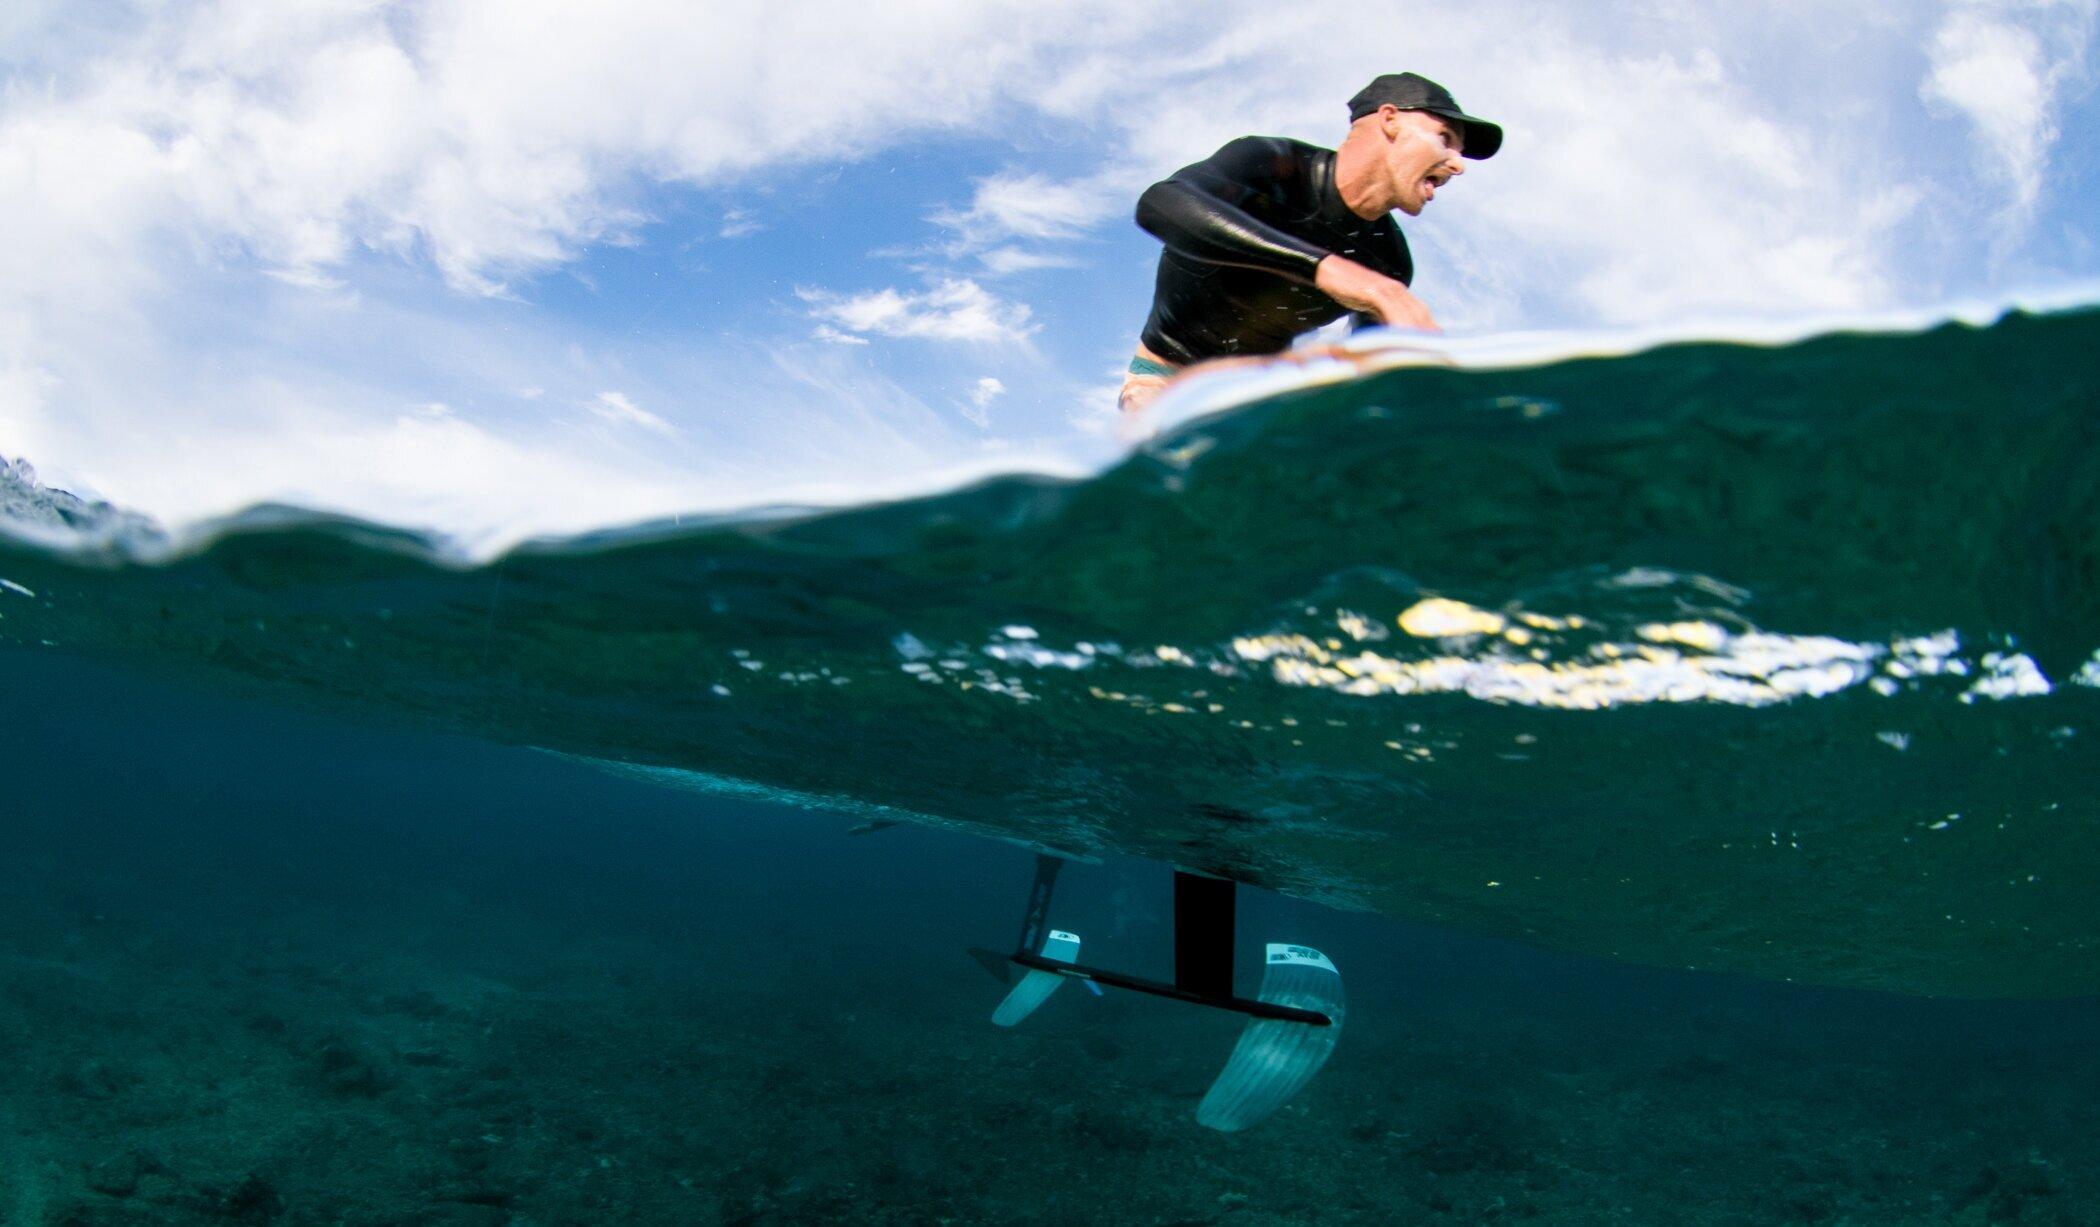 Nick Liotta_Dan Ross_Foil Surf FCD Foil Surfboard.jpg